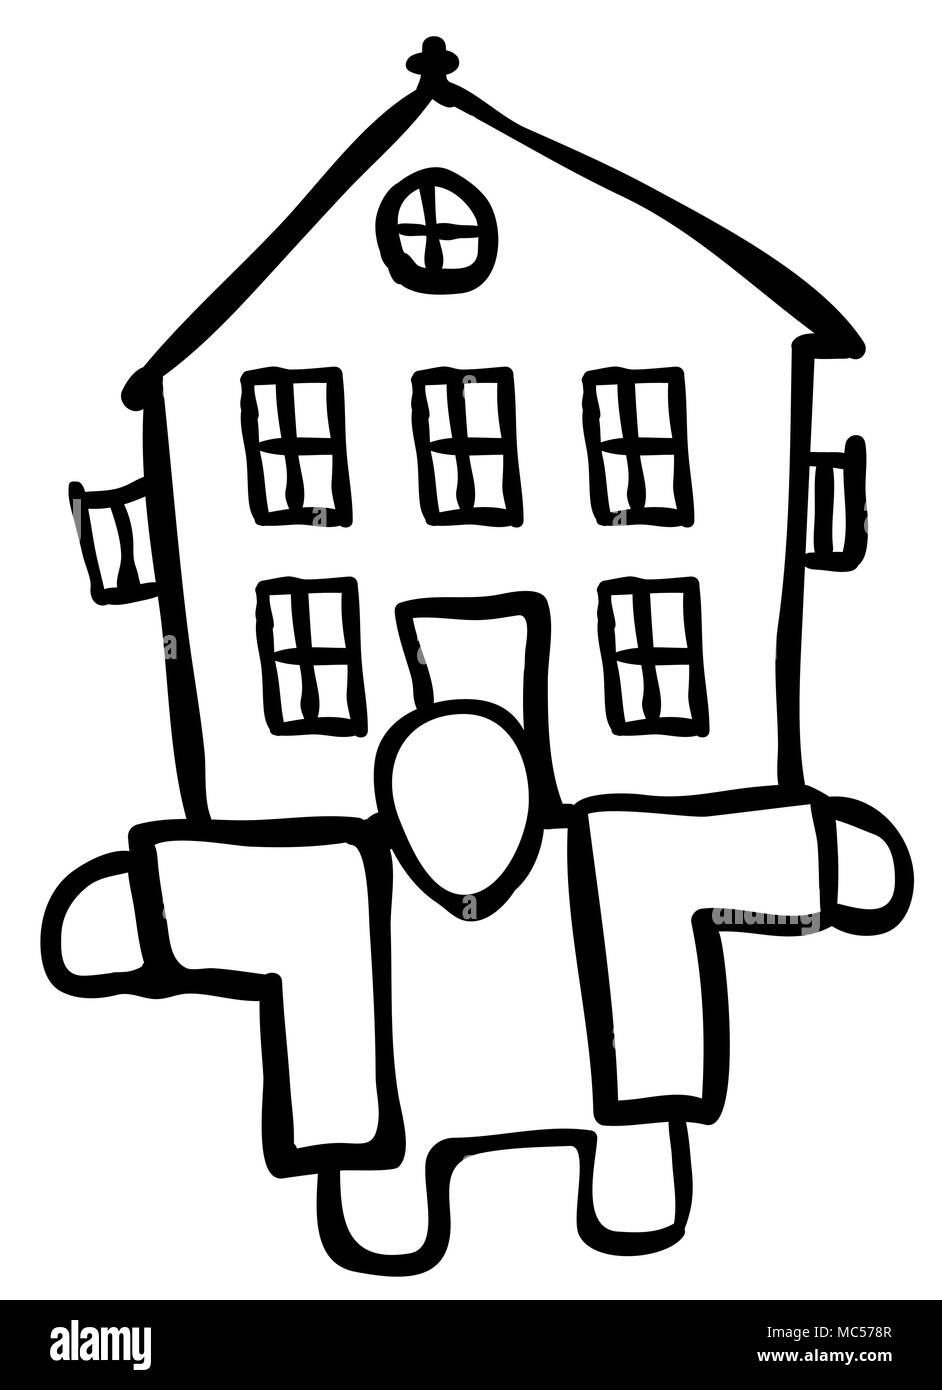 House holder figure drawing black, vector illustration, horizontal, isolated - Stock Image